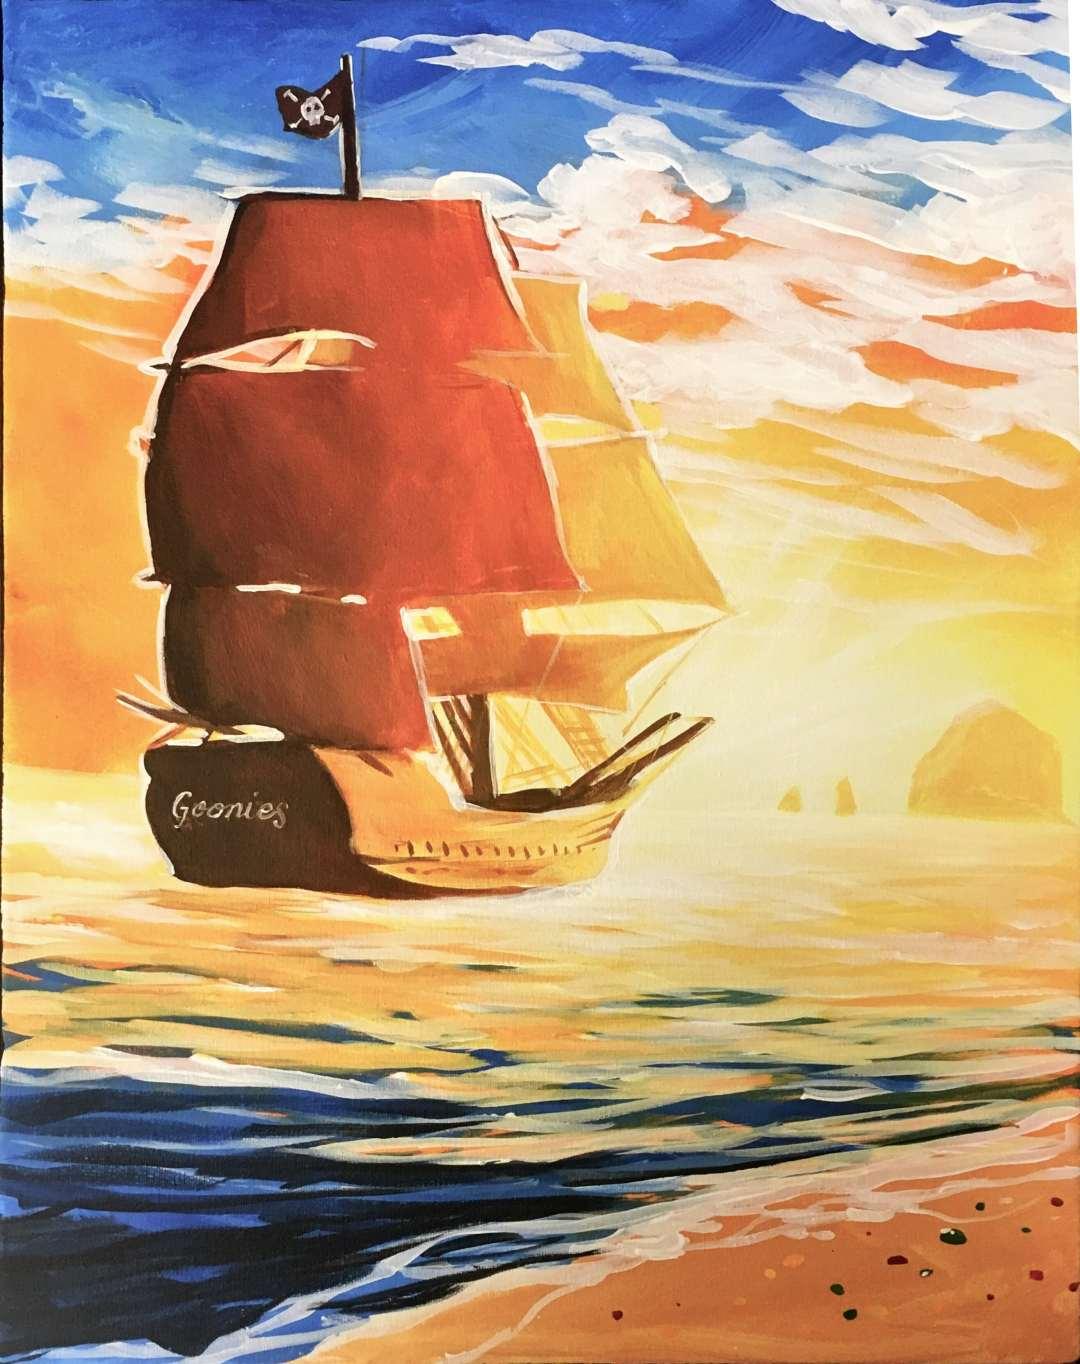 Goonies Pirate